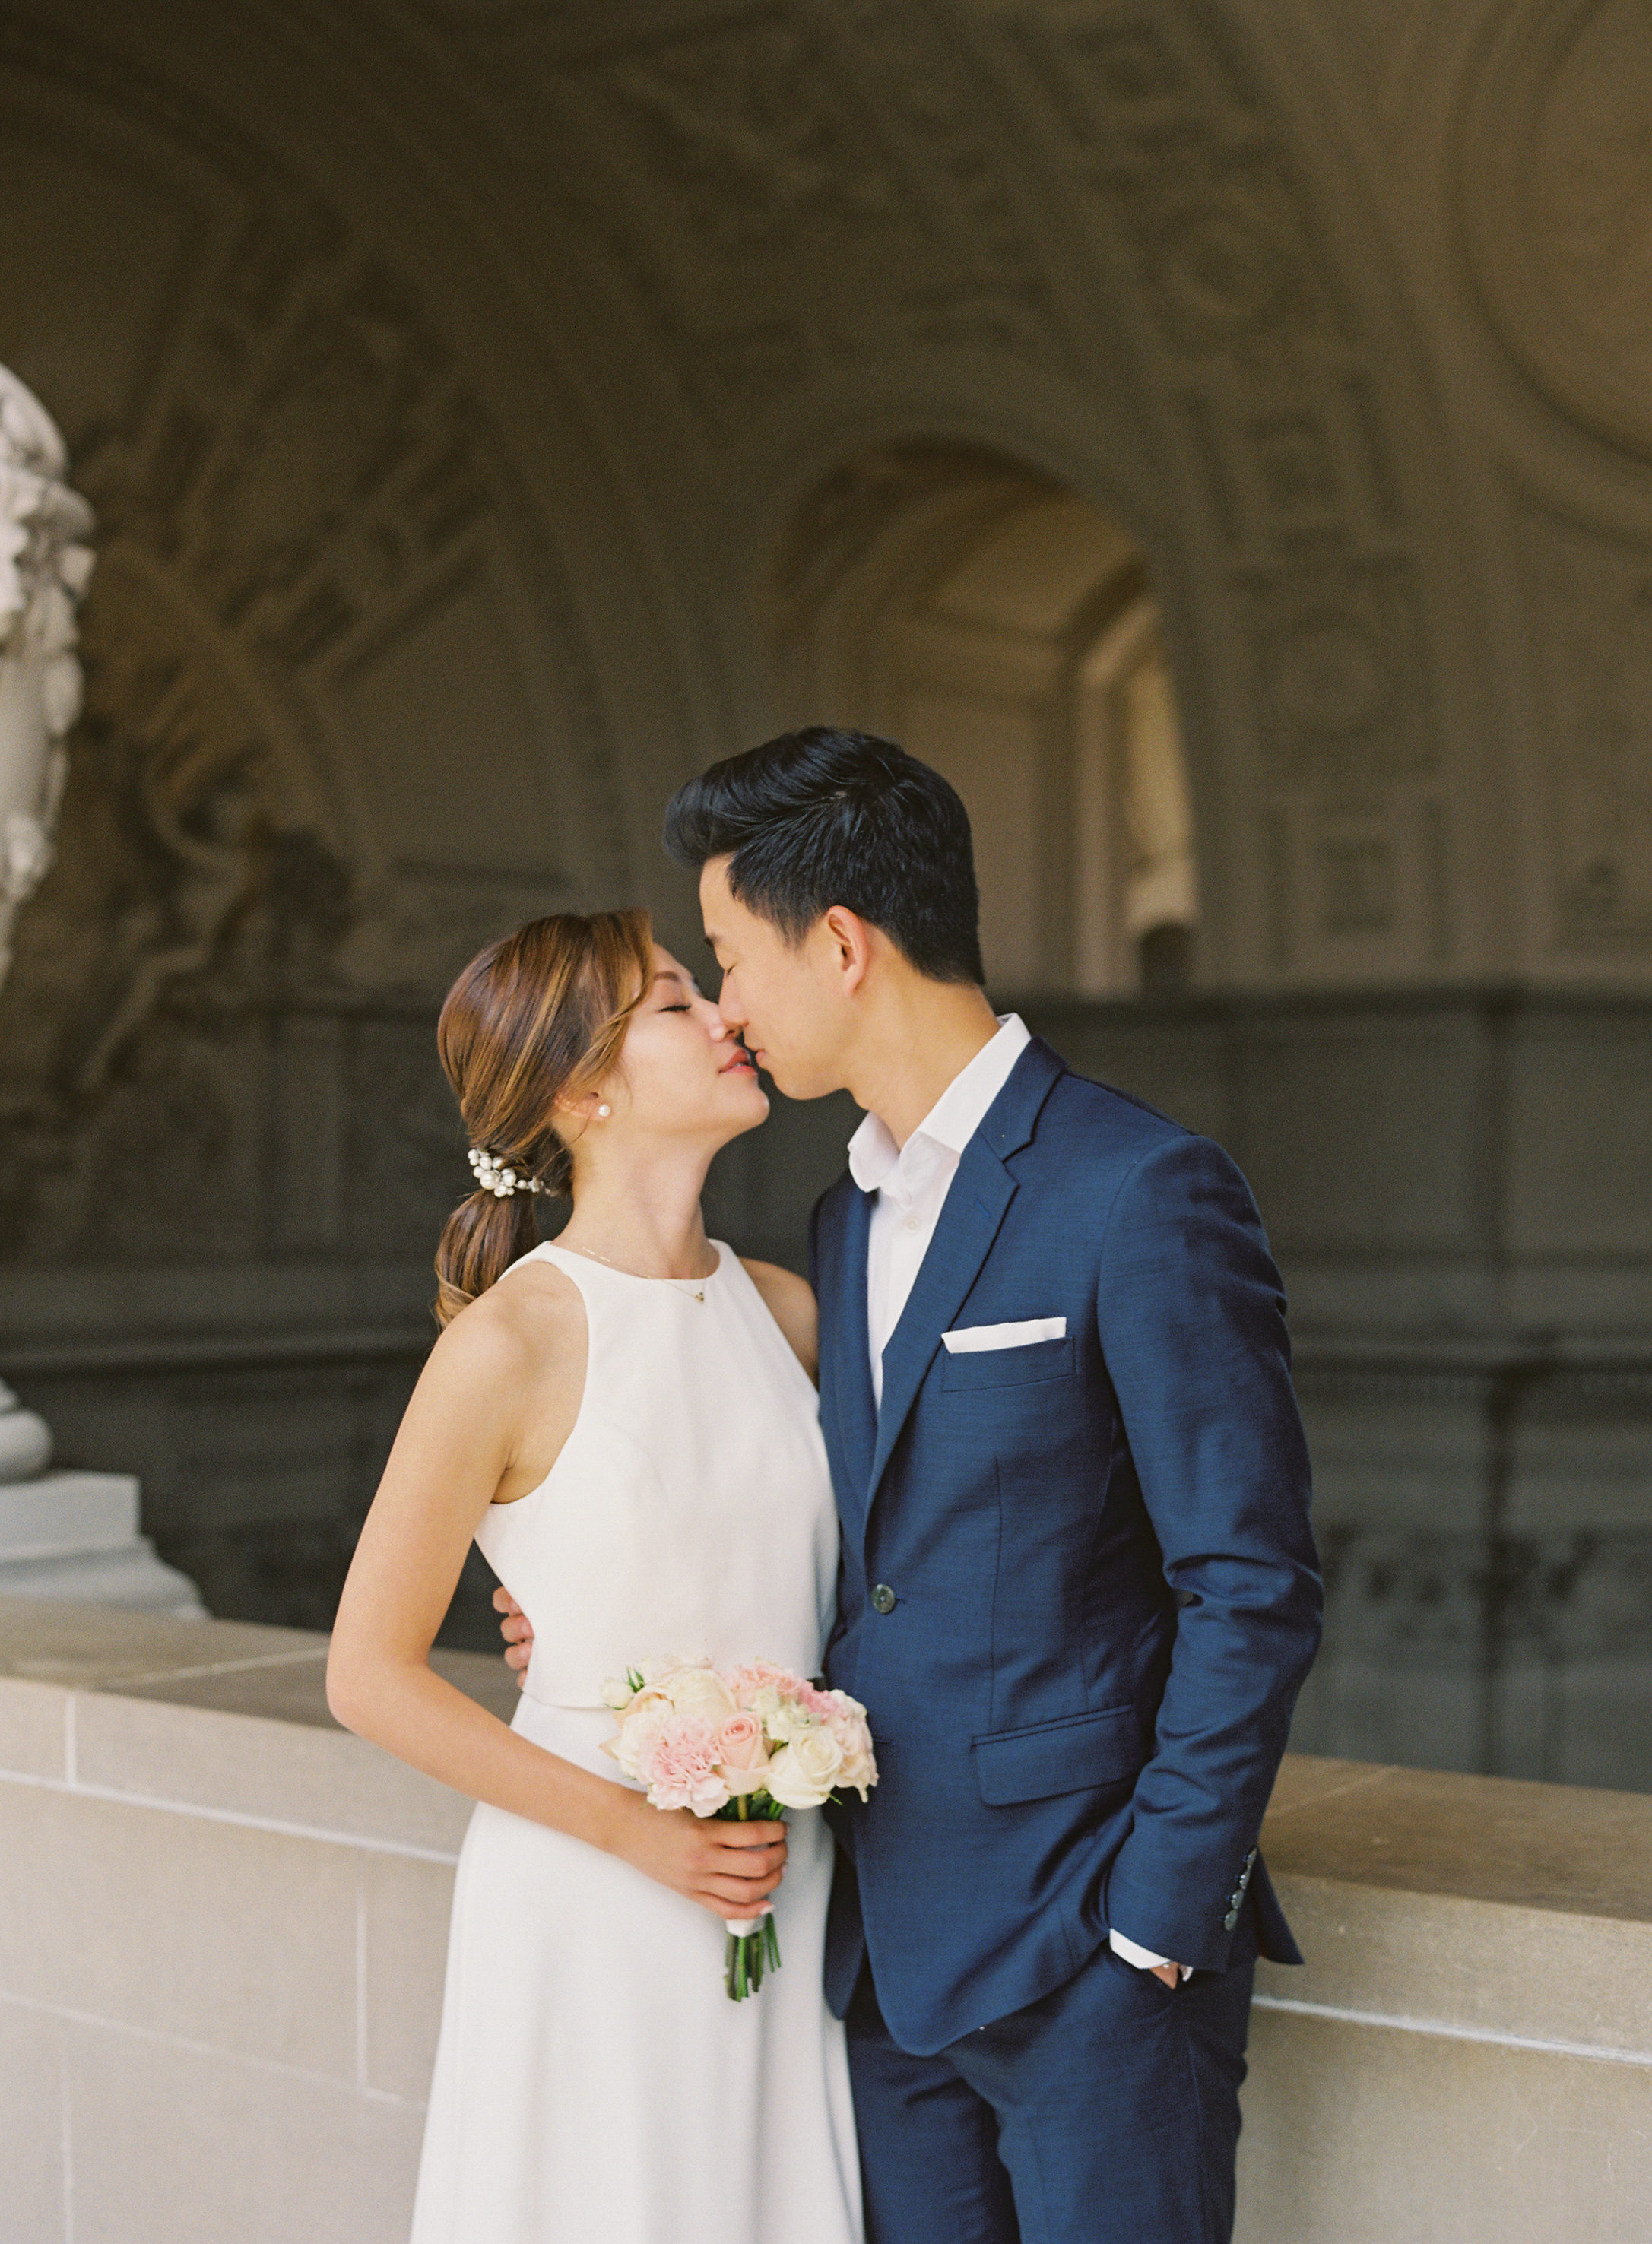 San-francisco-city-hall-photography-wedding-031.jpg